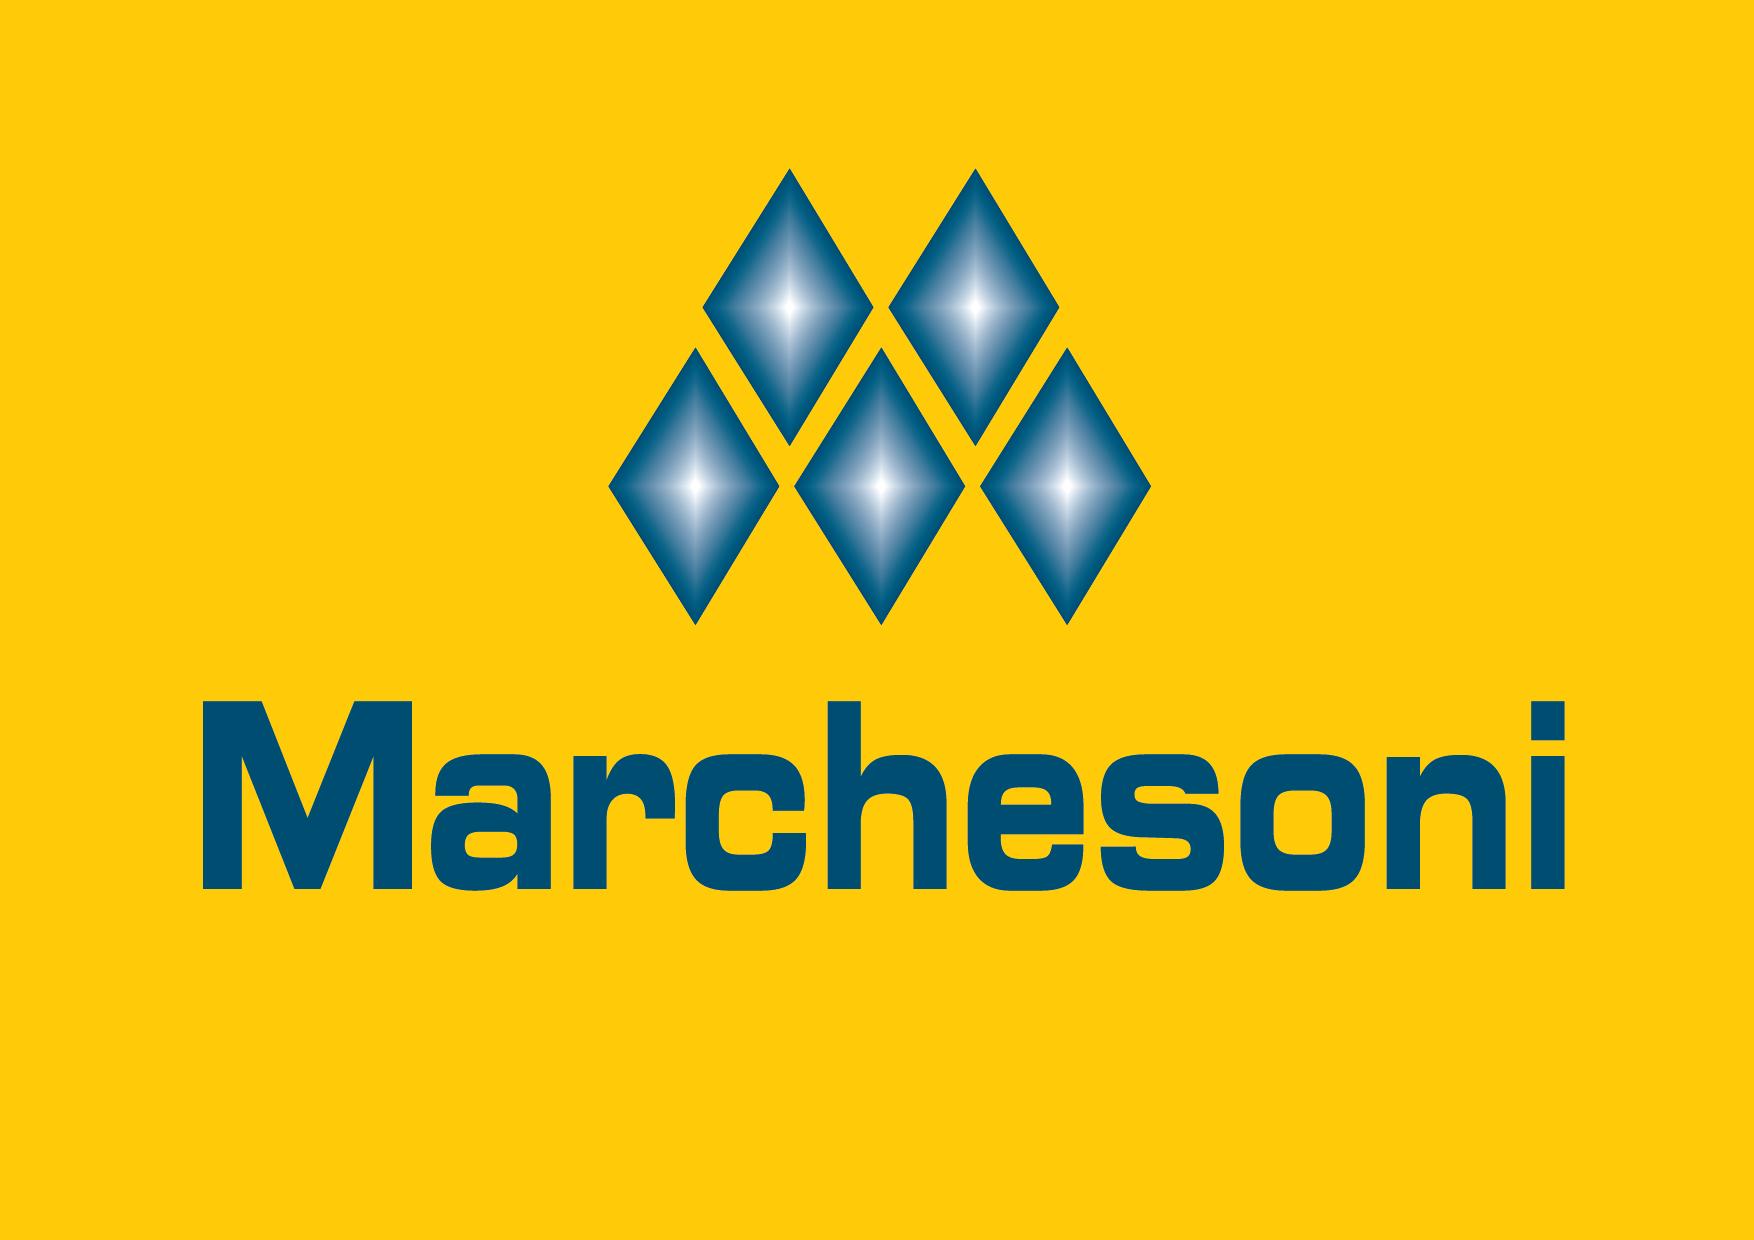 Fritadeira Elétrica Marchesoni 8 litros - FT1421/422  - Carmel Equipamentos